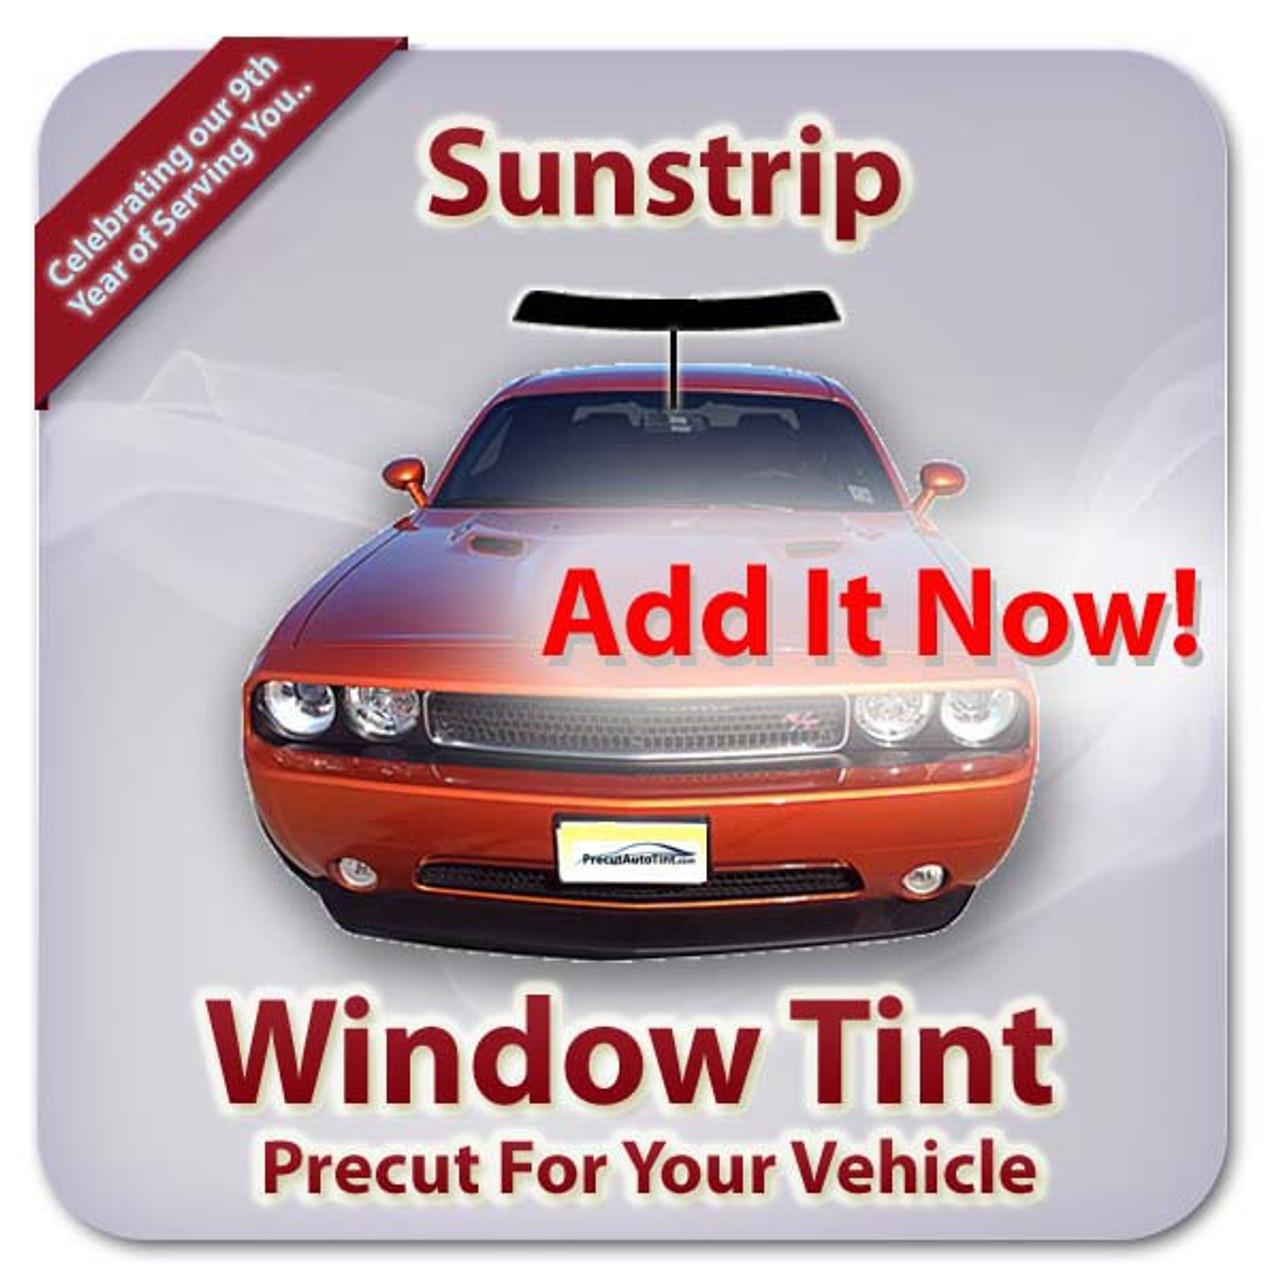 Precut Window Tint For GMC Sierra 2500 Double Cab 2015-2018 Rear Only